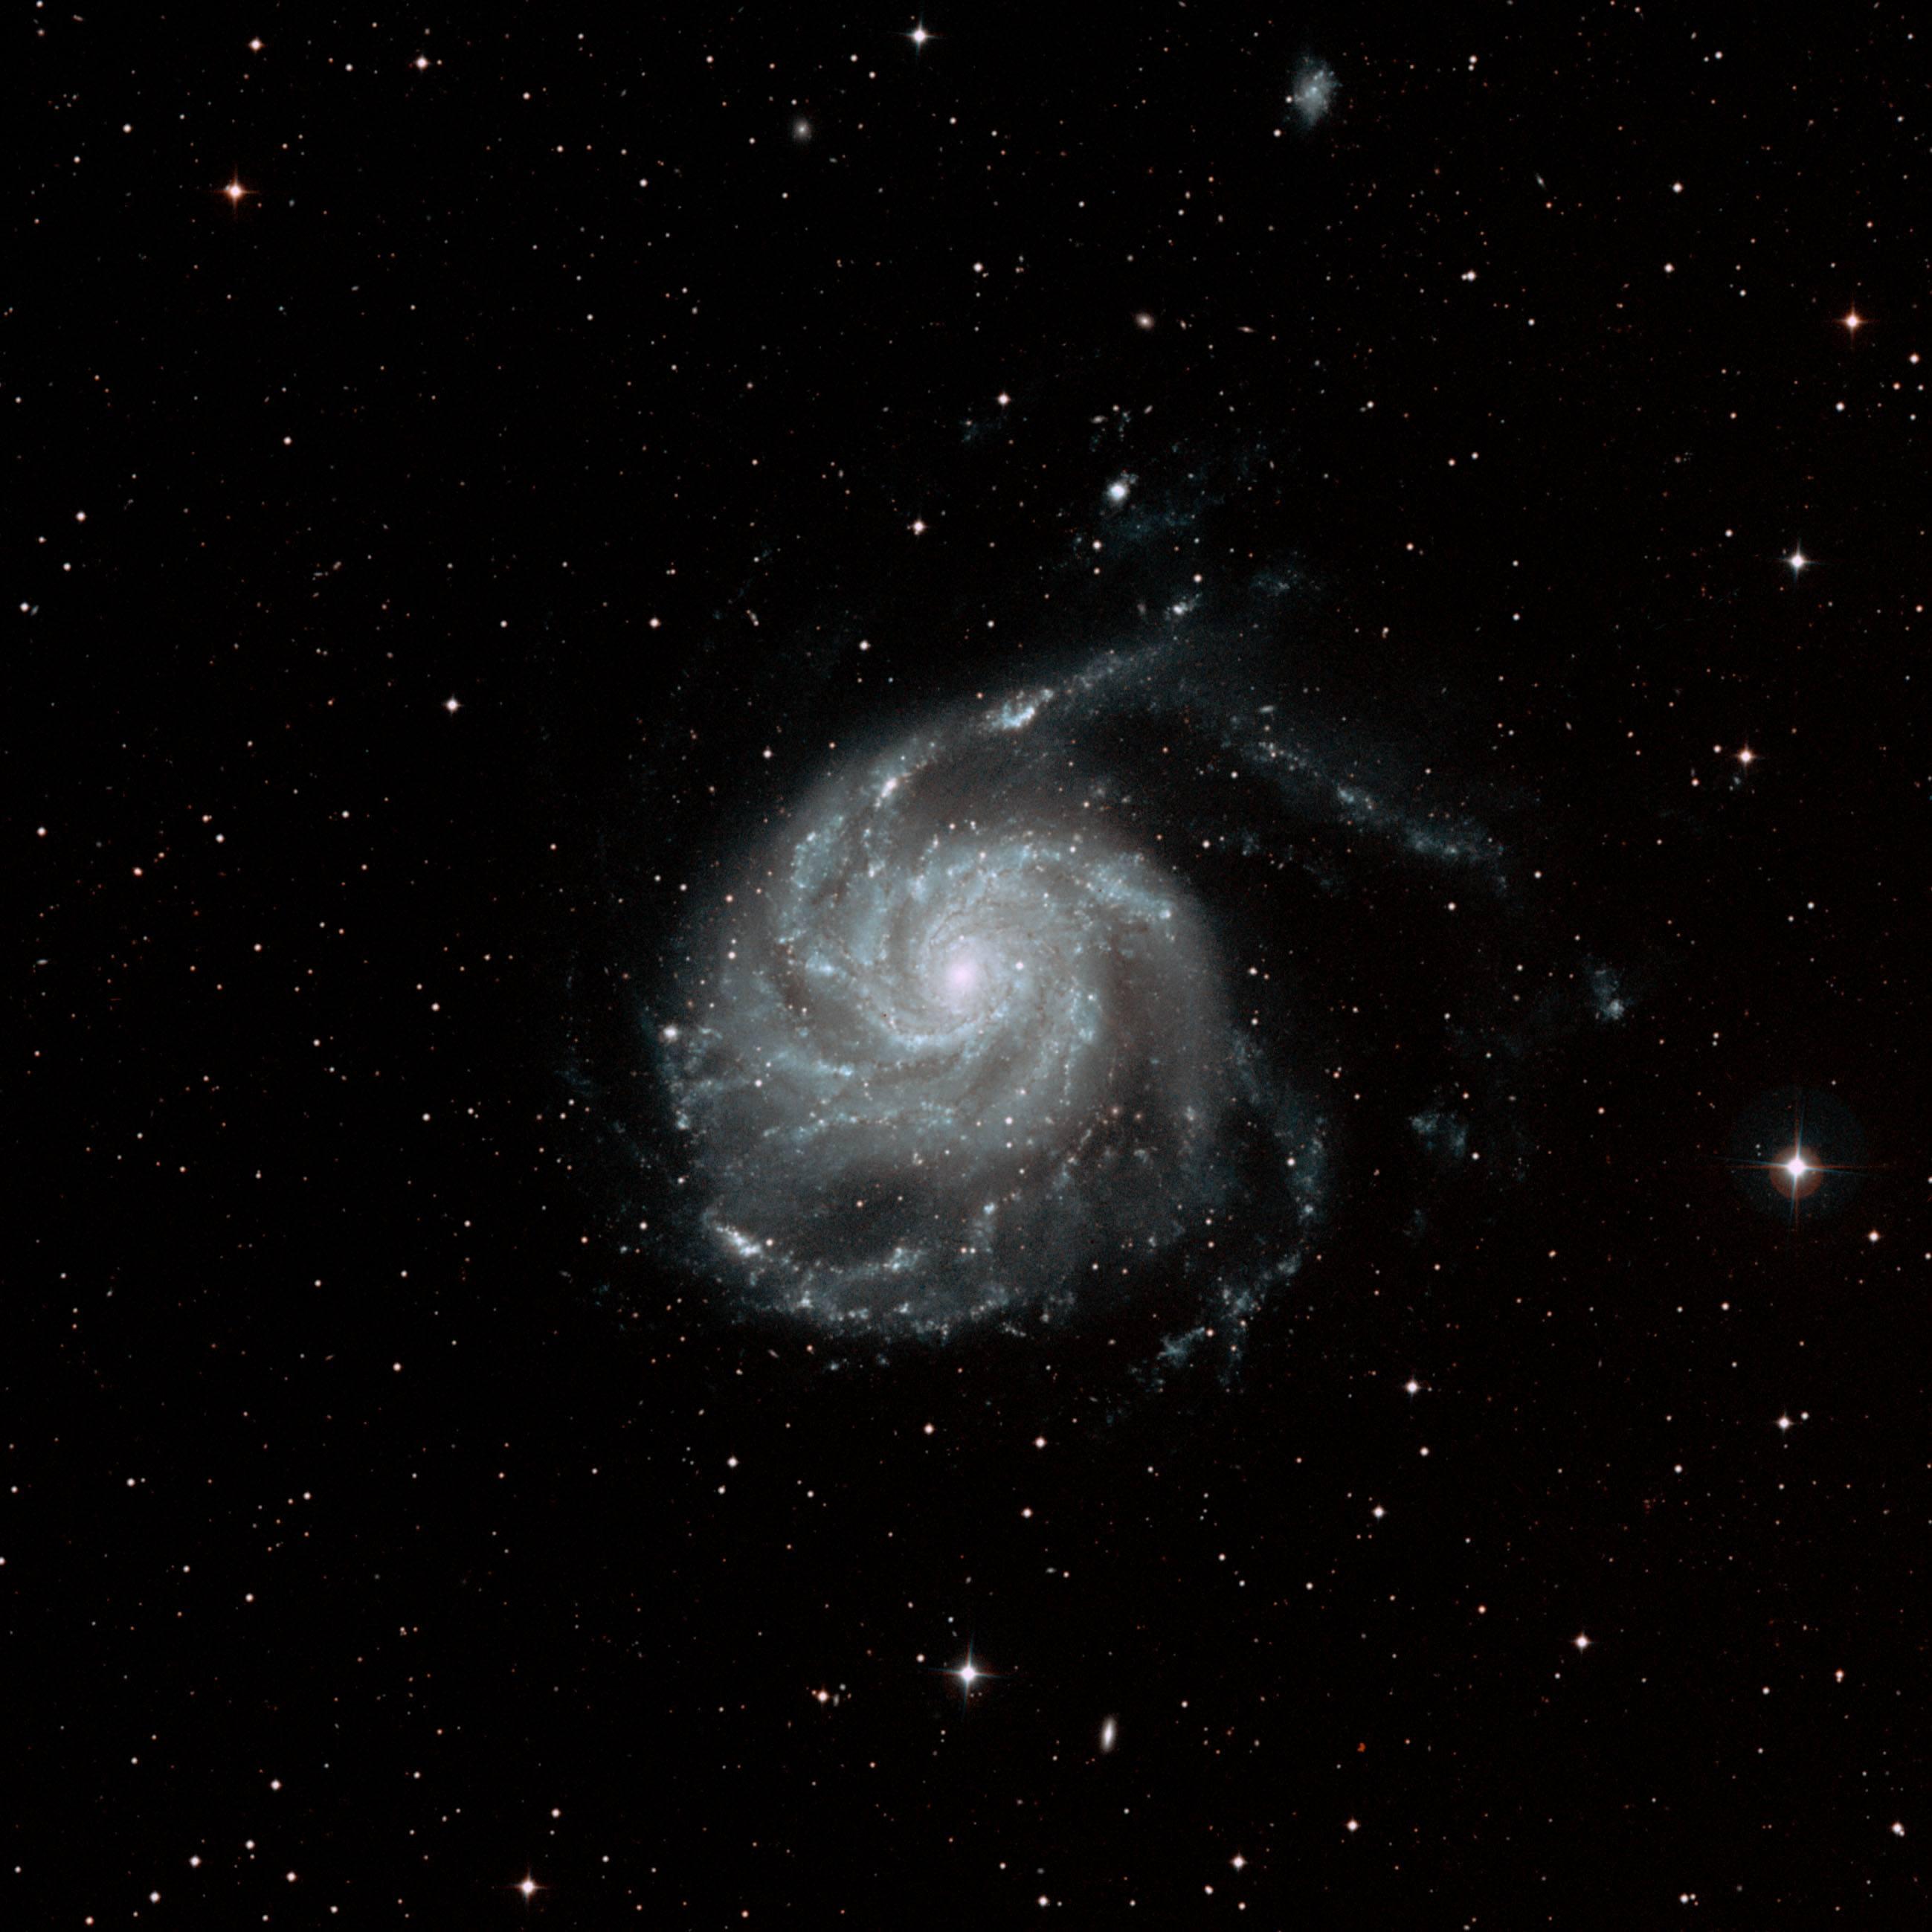 "<img src=""galaxy.jpg"" alt=""The Pinwheel Galaxy seen through a telescope"">"